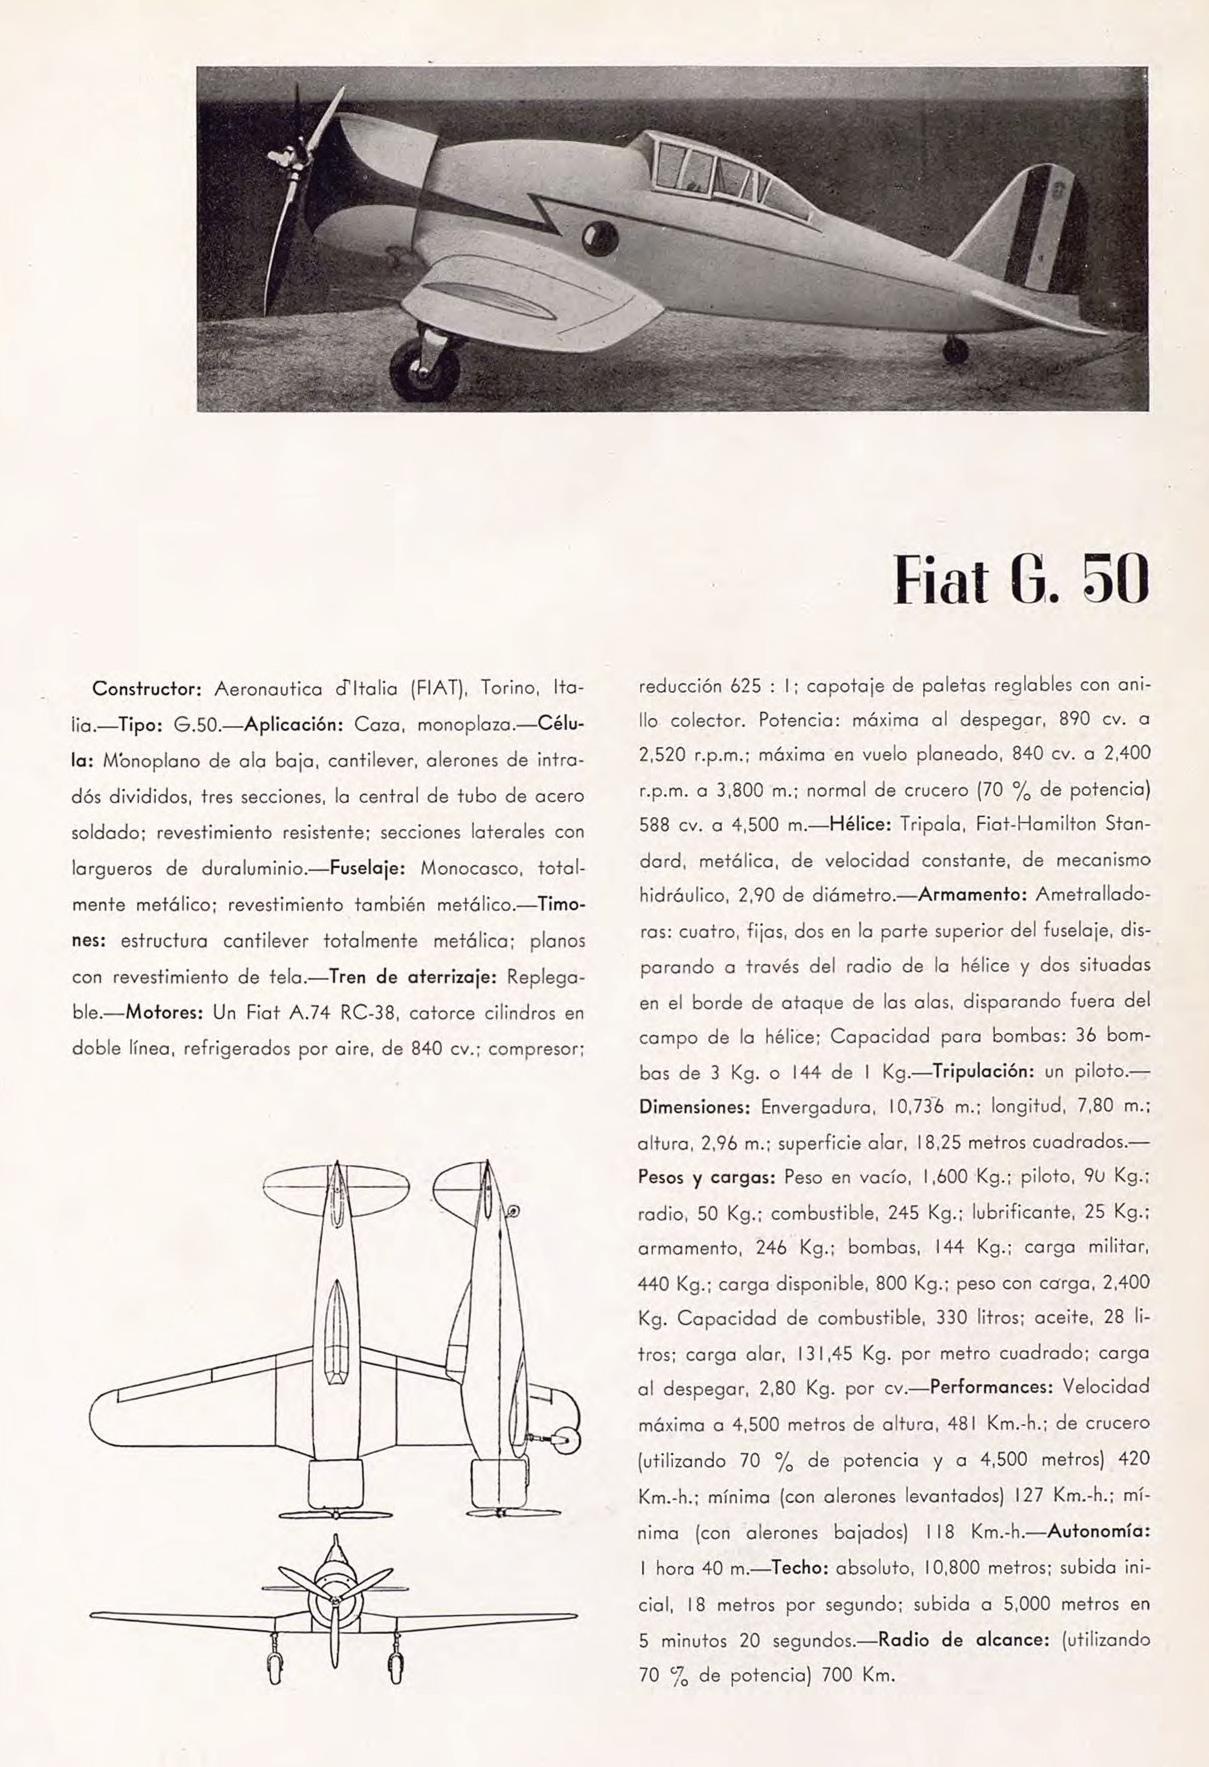 Fiat G.50: primer caza monoplano de la Regia Aeronautica